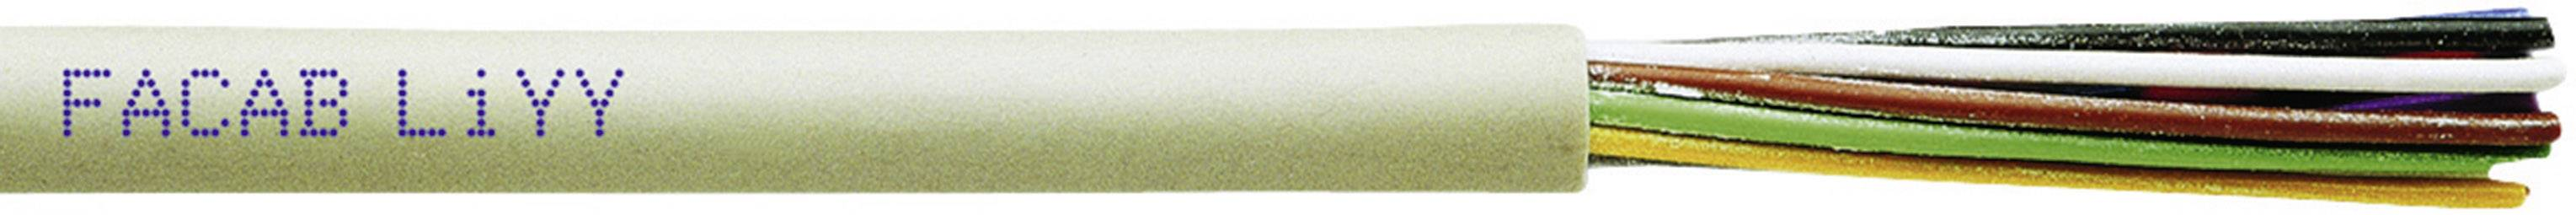 Riadiaci kábel Faber Kabel LiYY 030174, 2 x 0.14 mm², vonkajší Ø 3.20 mm, 250 V, metrový tovar, sivá